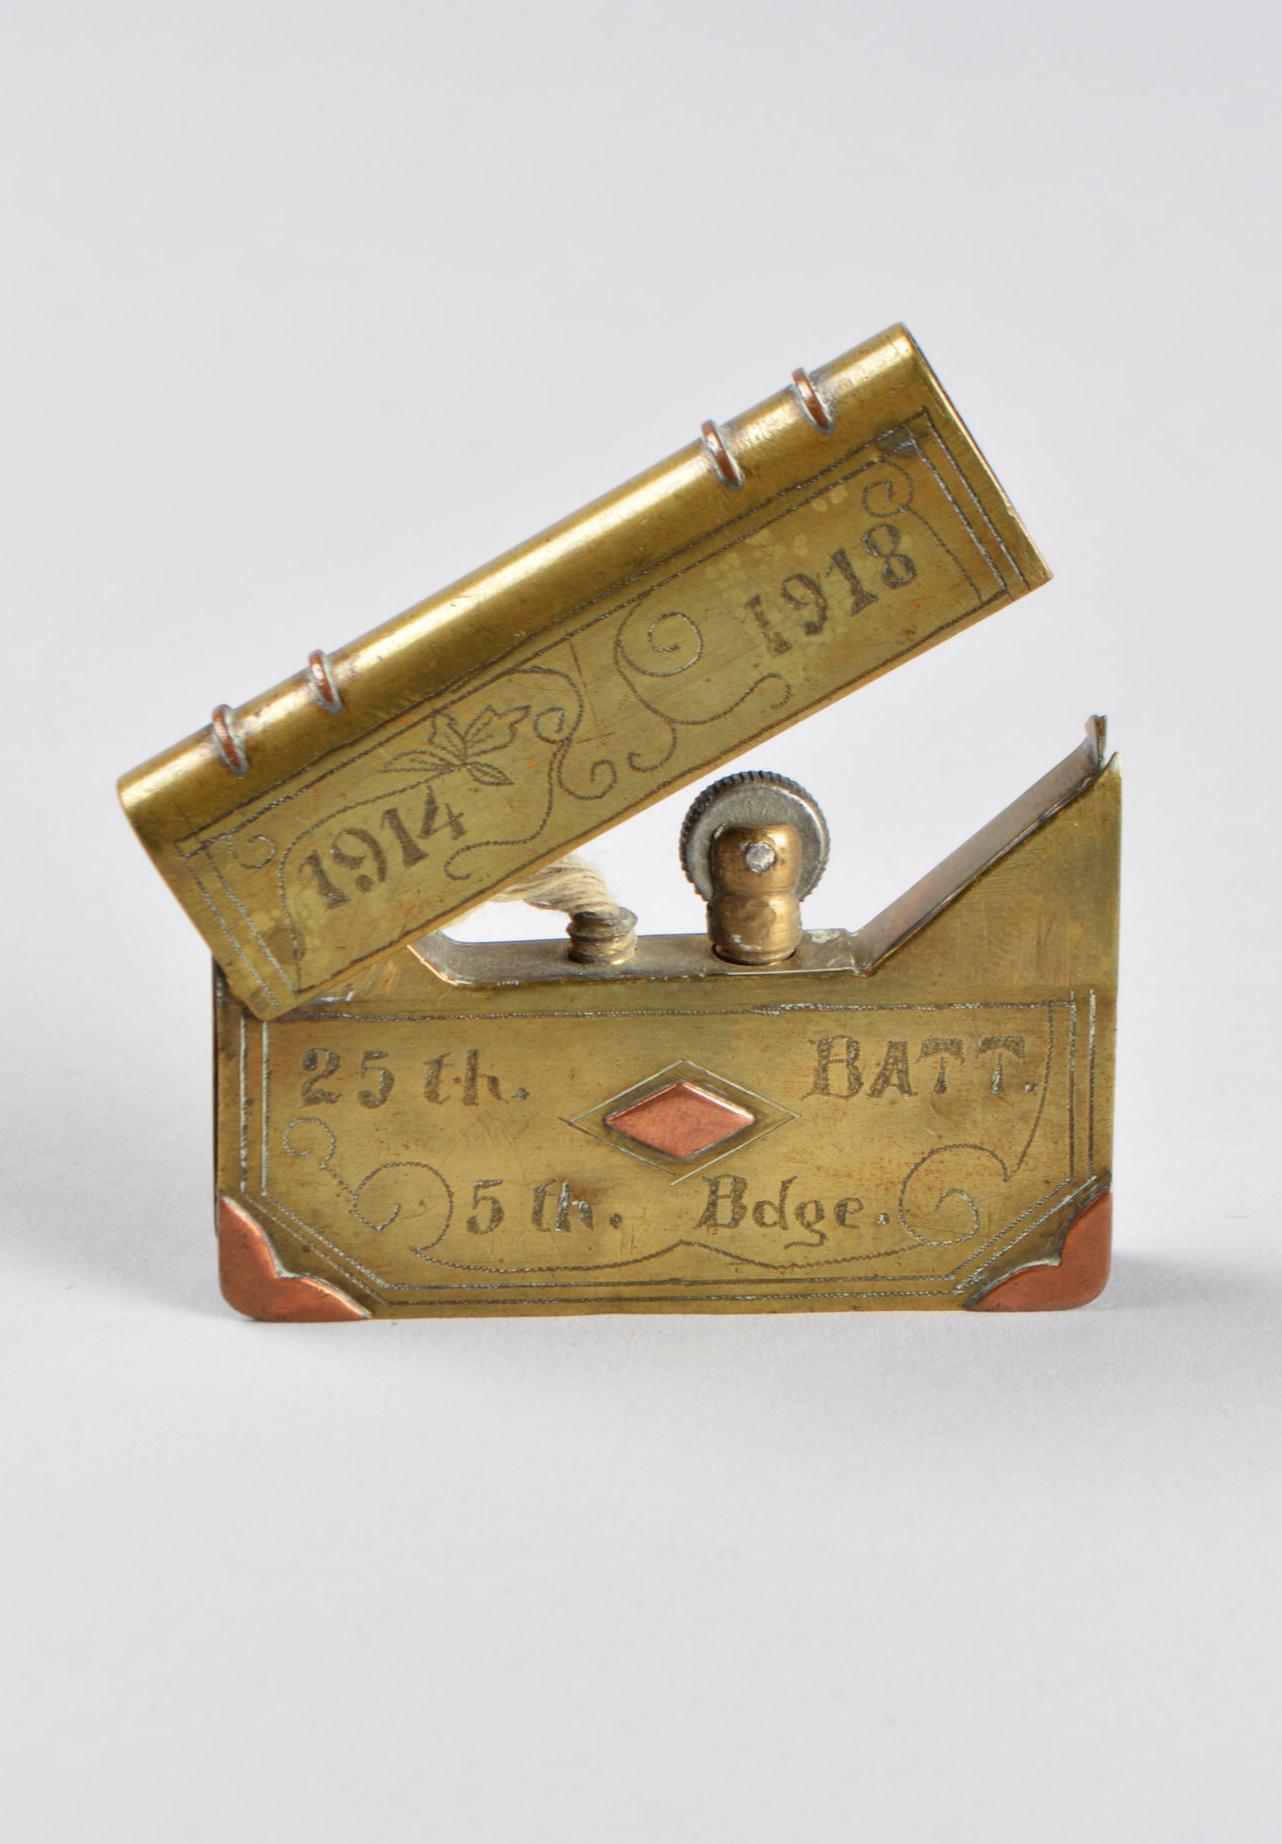 Lighter, brass, metal, cotton wick, 4.3 x 6.2 x 0.9 cm. Collection of Army Museum Halifax Citadel, Halifax, NS, XPE/88/1251. Photo: Gabriela García-Luna, Moose Jaw Museum & Art Gallery